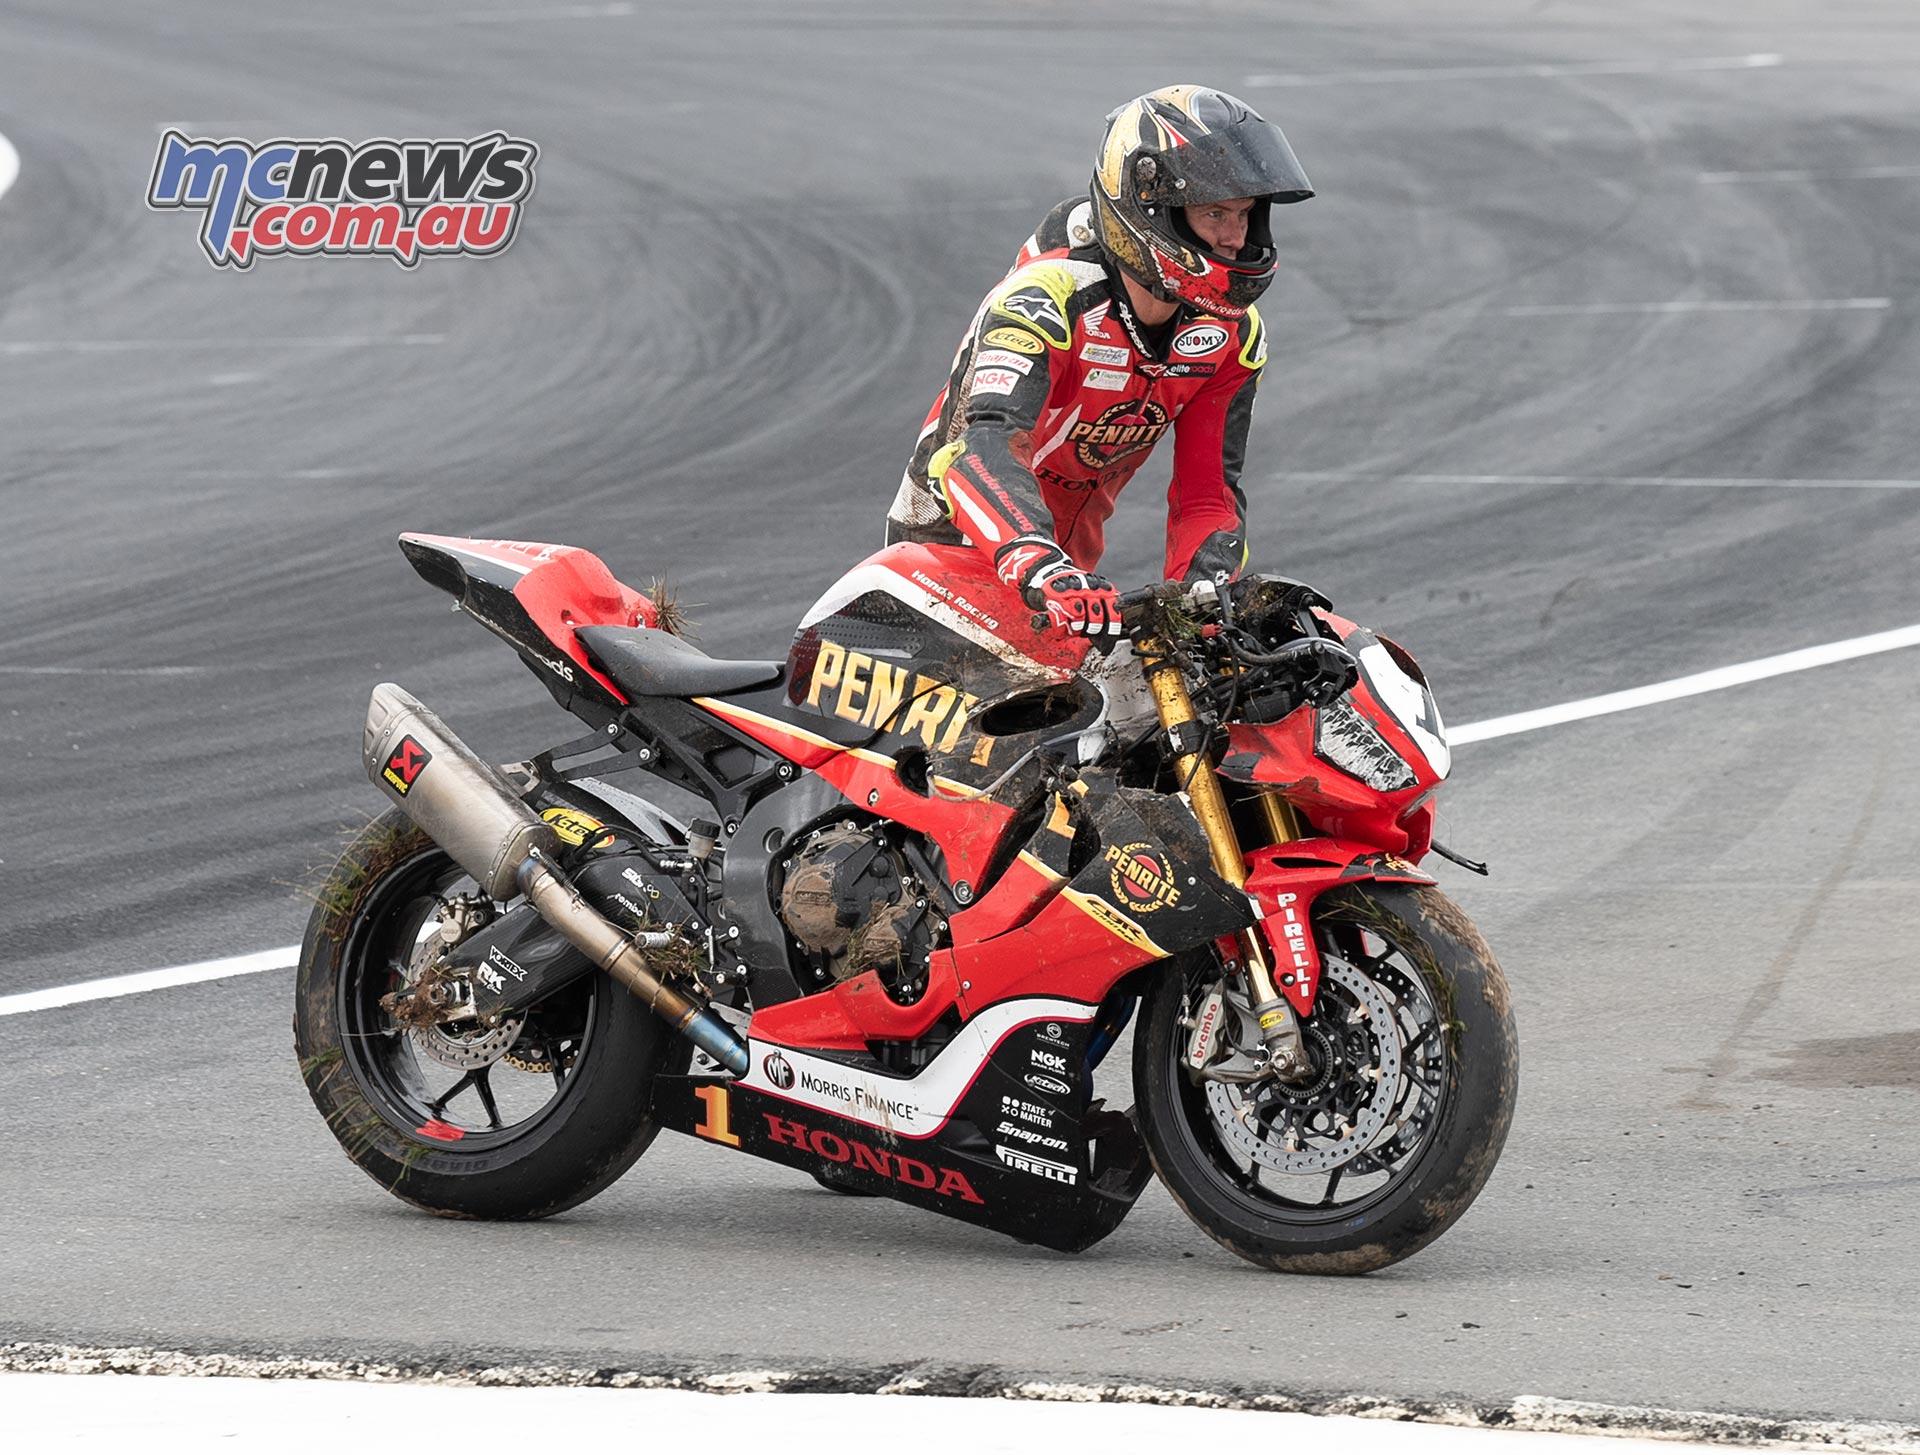 ASBK Rnd Winton RbMotoLens SBK Troy HERFOSS Crashed bike